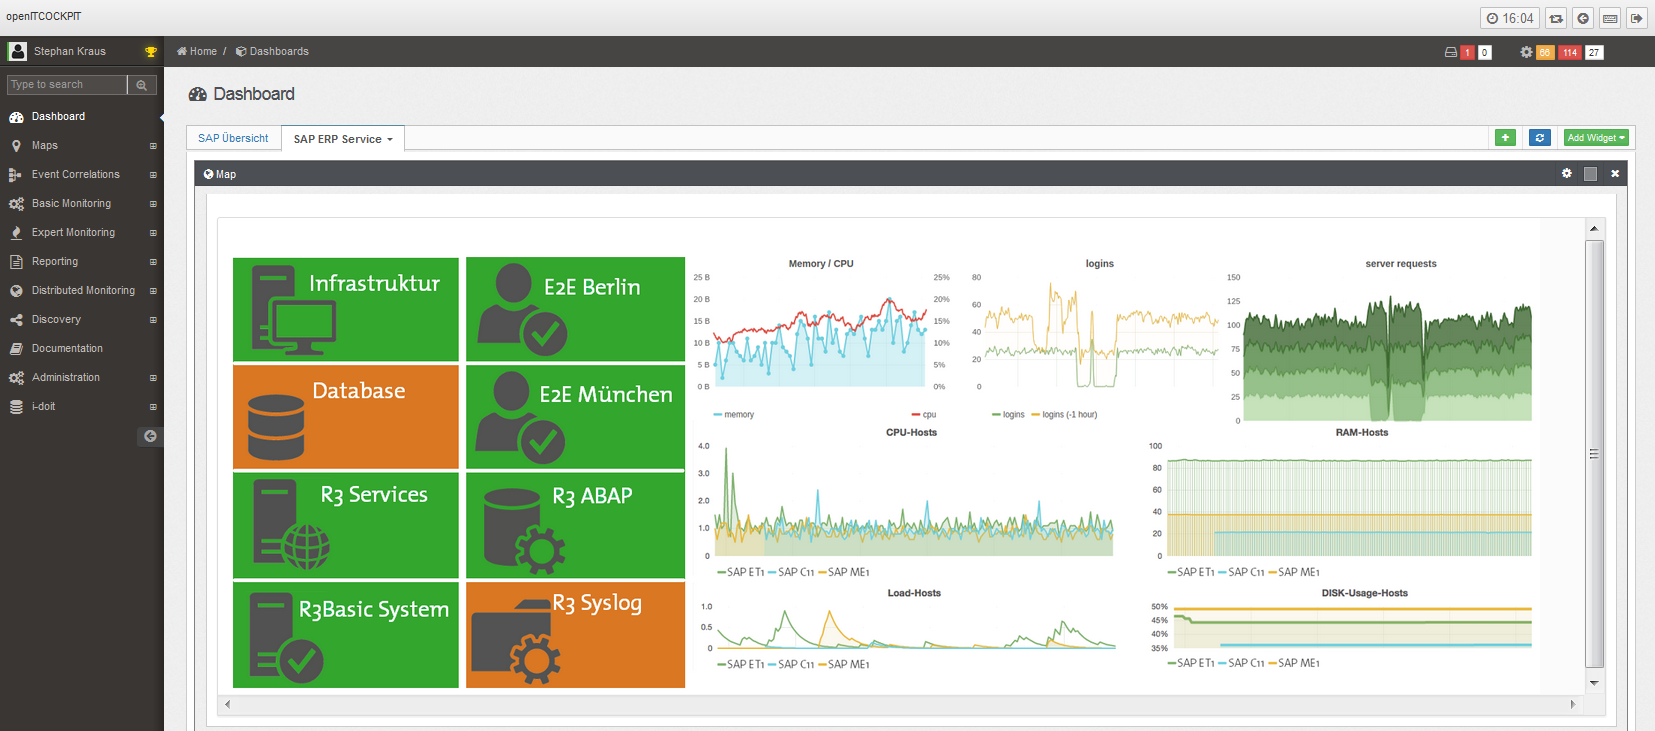 SAP Monitoring - it-novum on sap enterprise map, sap security map, risk heat map, it services map, sap process map, sap strategy map, sap netweaver map, infor solution map, sap marketing map, problem and solution map, sap value map, sap product map, sap road map, deloitte solution map, sap customer map, sap data map,